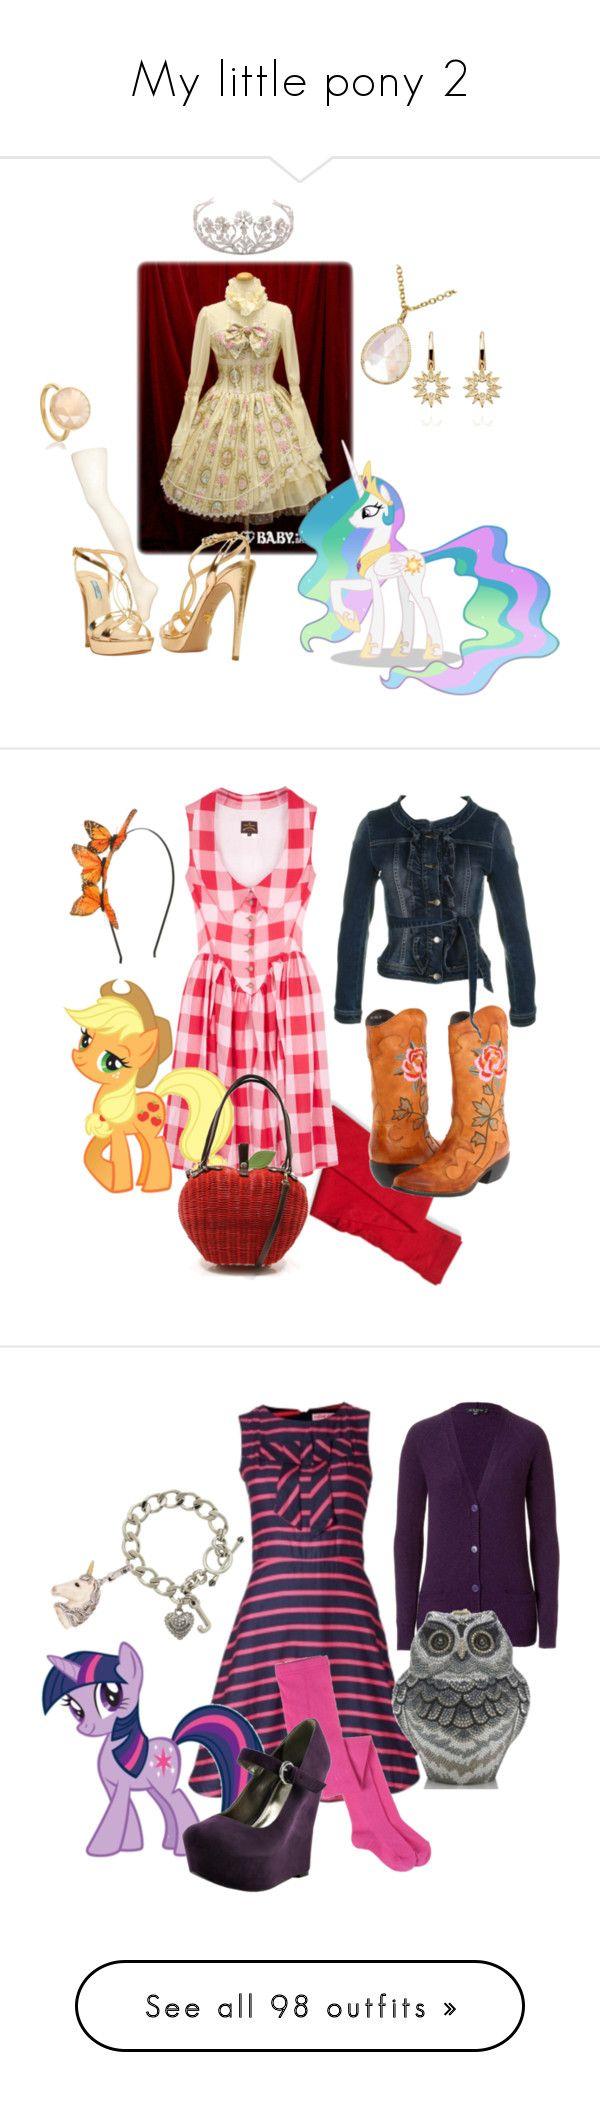 """My little pony 2"" by sweeetgirl ❤ liked on Polyvore featuring Coach, TIARA, Irene Neuwirth, Astley Clarke, Pretty Polly, Prada, lolita, art, applejack and my little pony"